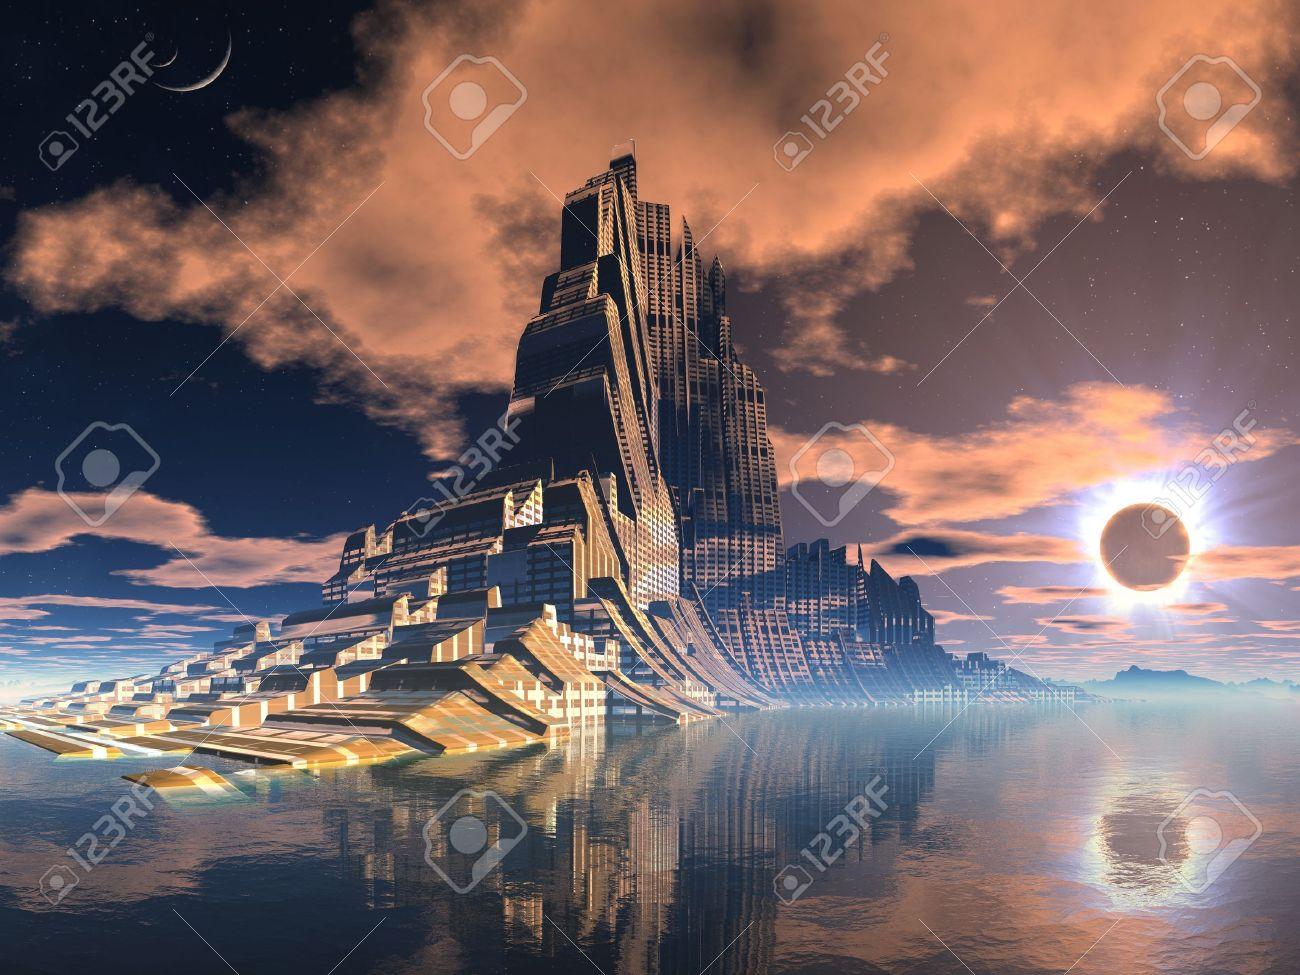 Futuristic Alien City at Lunar Eclipse Stock Photo - 10480250